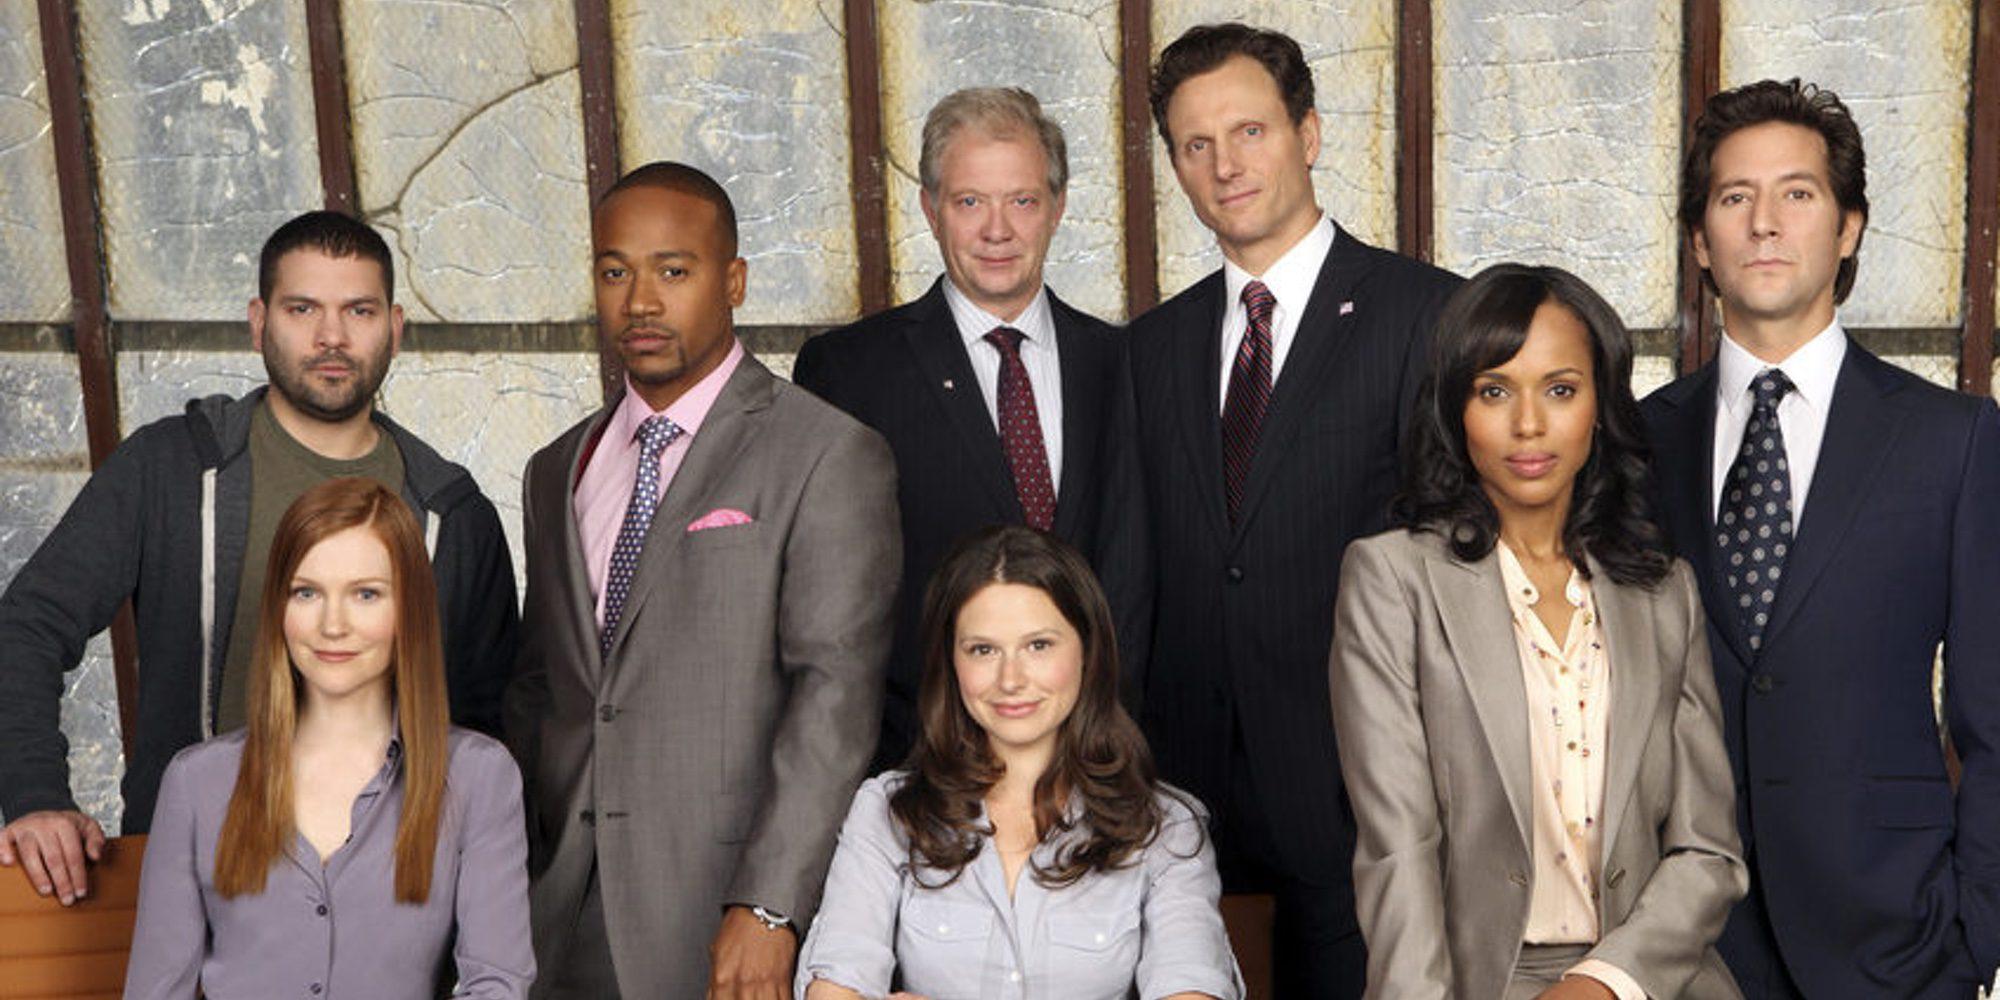 'Scandal' acabará tras su séptima temporada